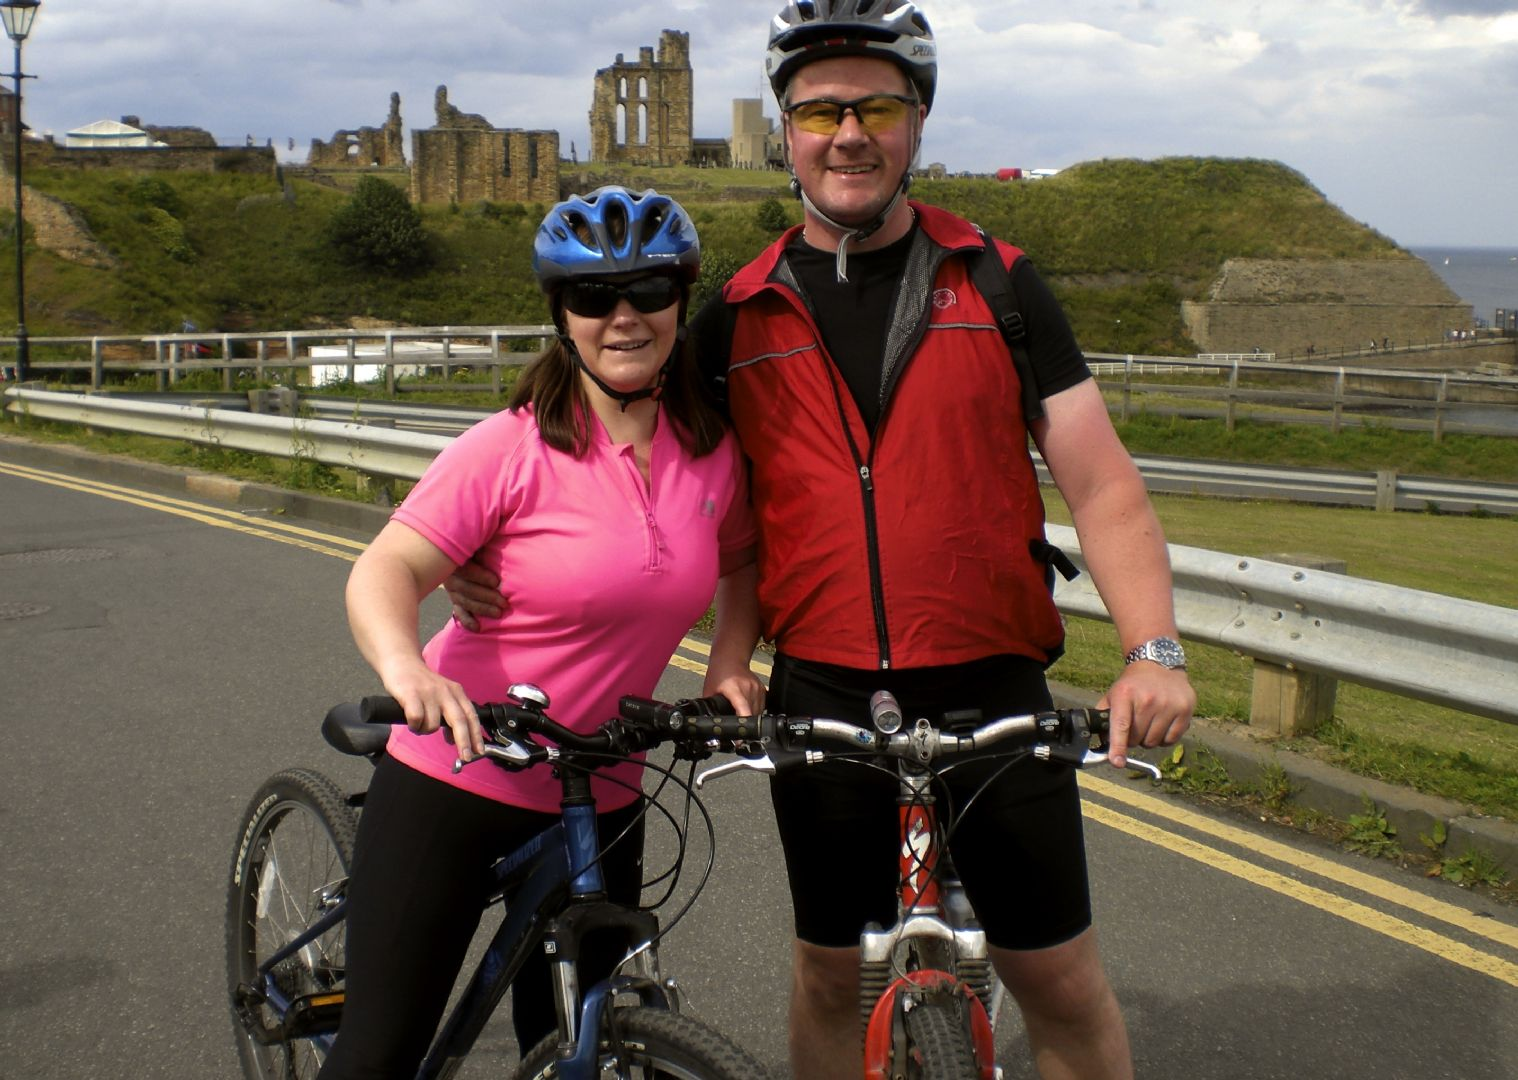 4904065250_e117074206_o.jpg - UK - C2C - Coast to Coast 5 Days Cycling - Self-Guided Leisure Cycling Holiday - Leisure Cycling